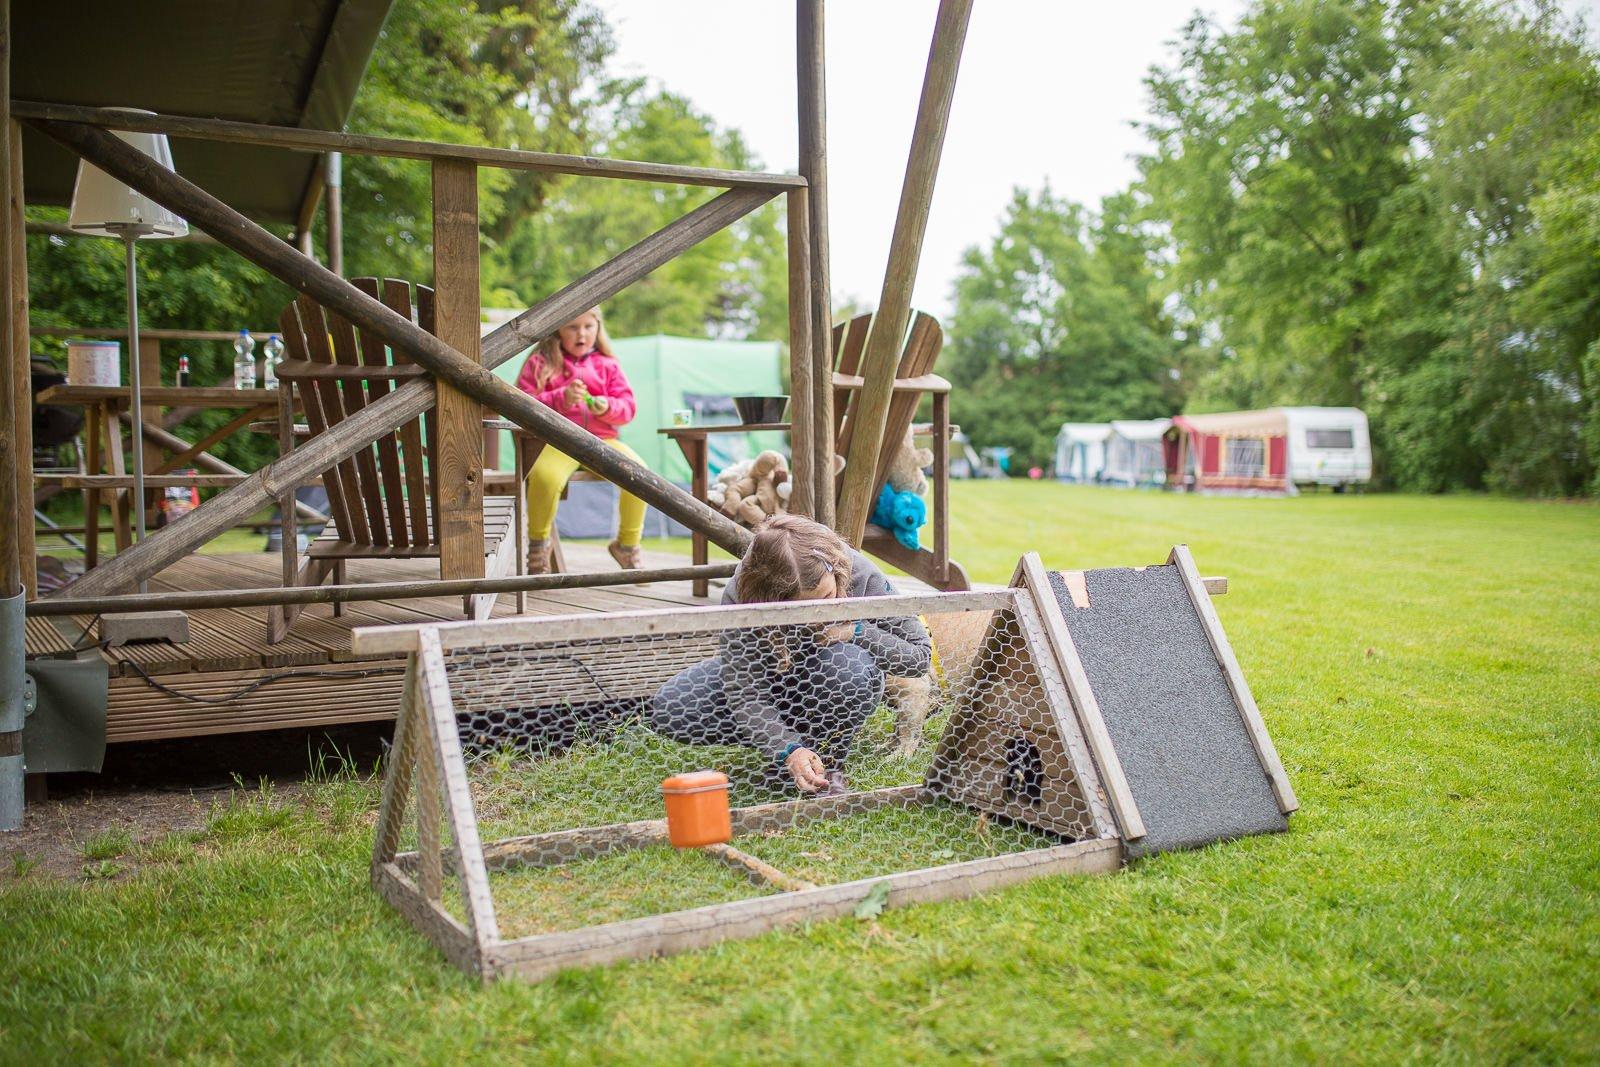 farmcamps kaninchen versorgen